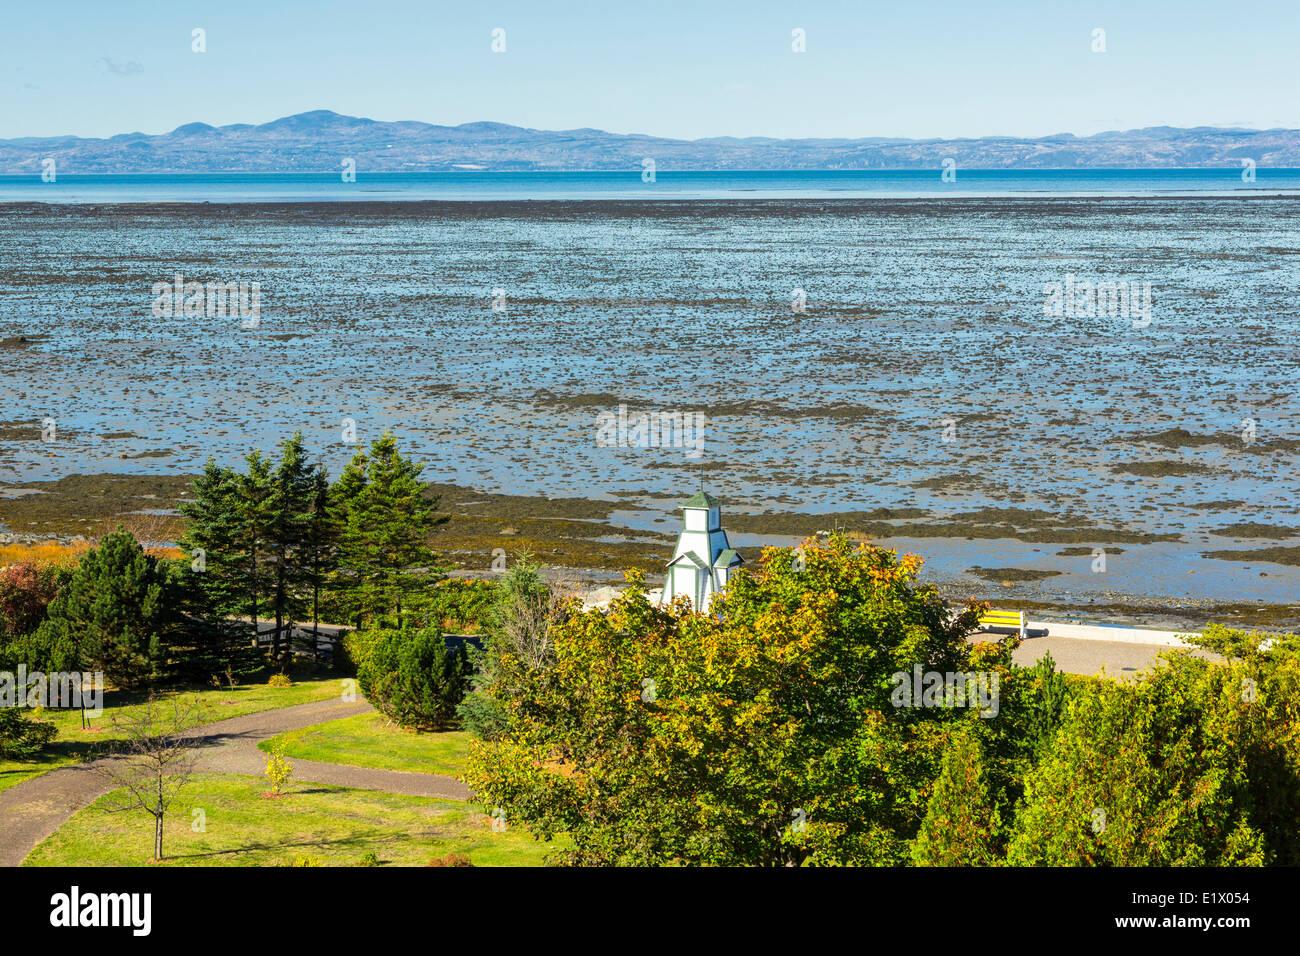 St. Lawrence River, Kamouraska, Quebec, Canada - Stock Image